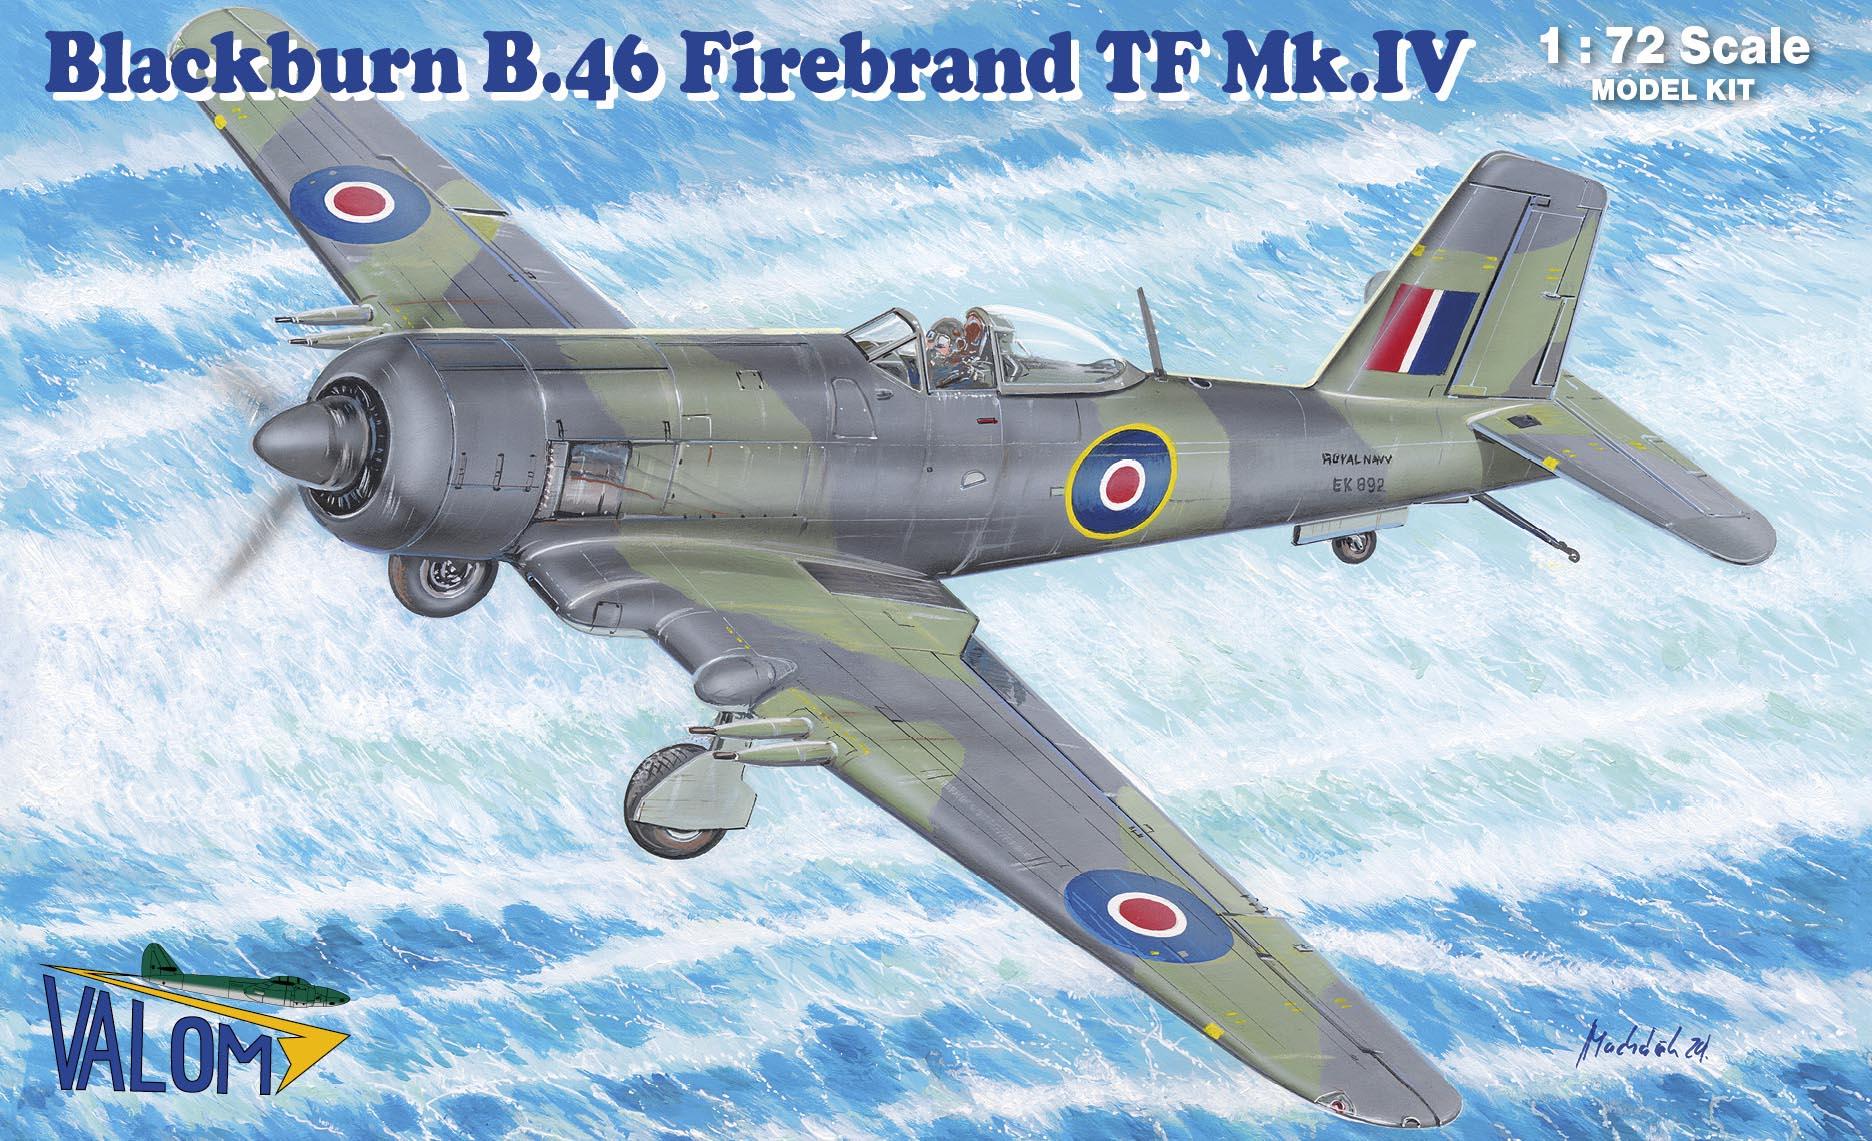 Valom Blackburn Firebrand TF.Mk.IV